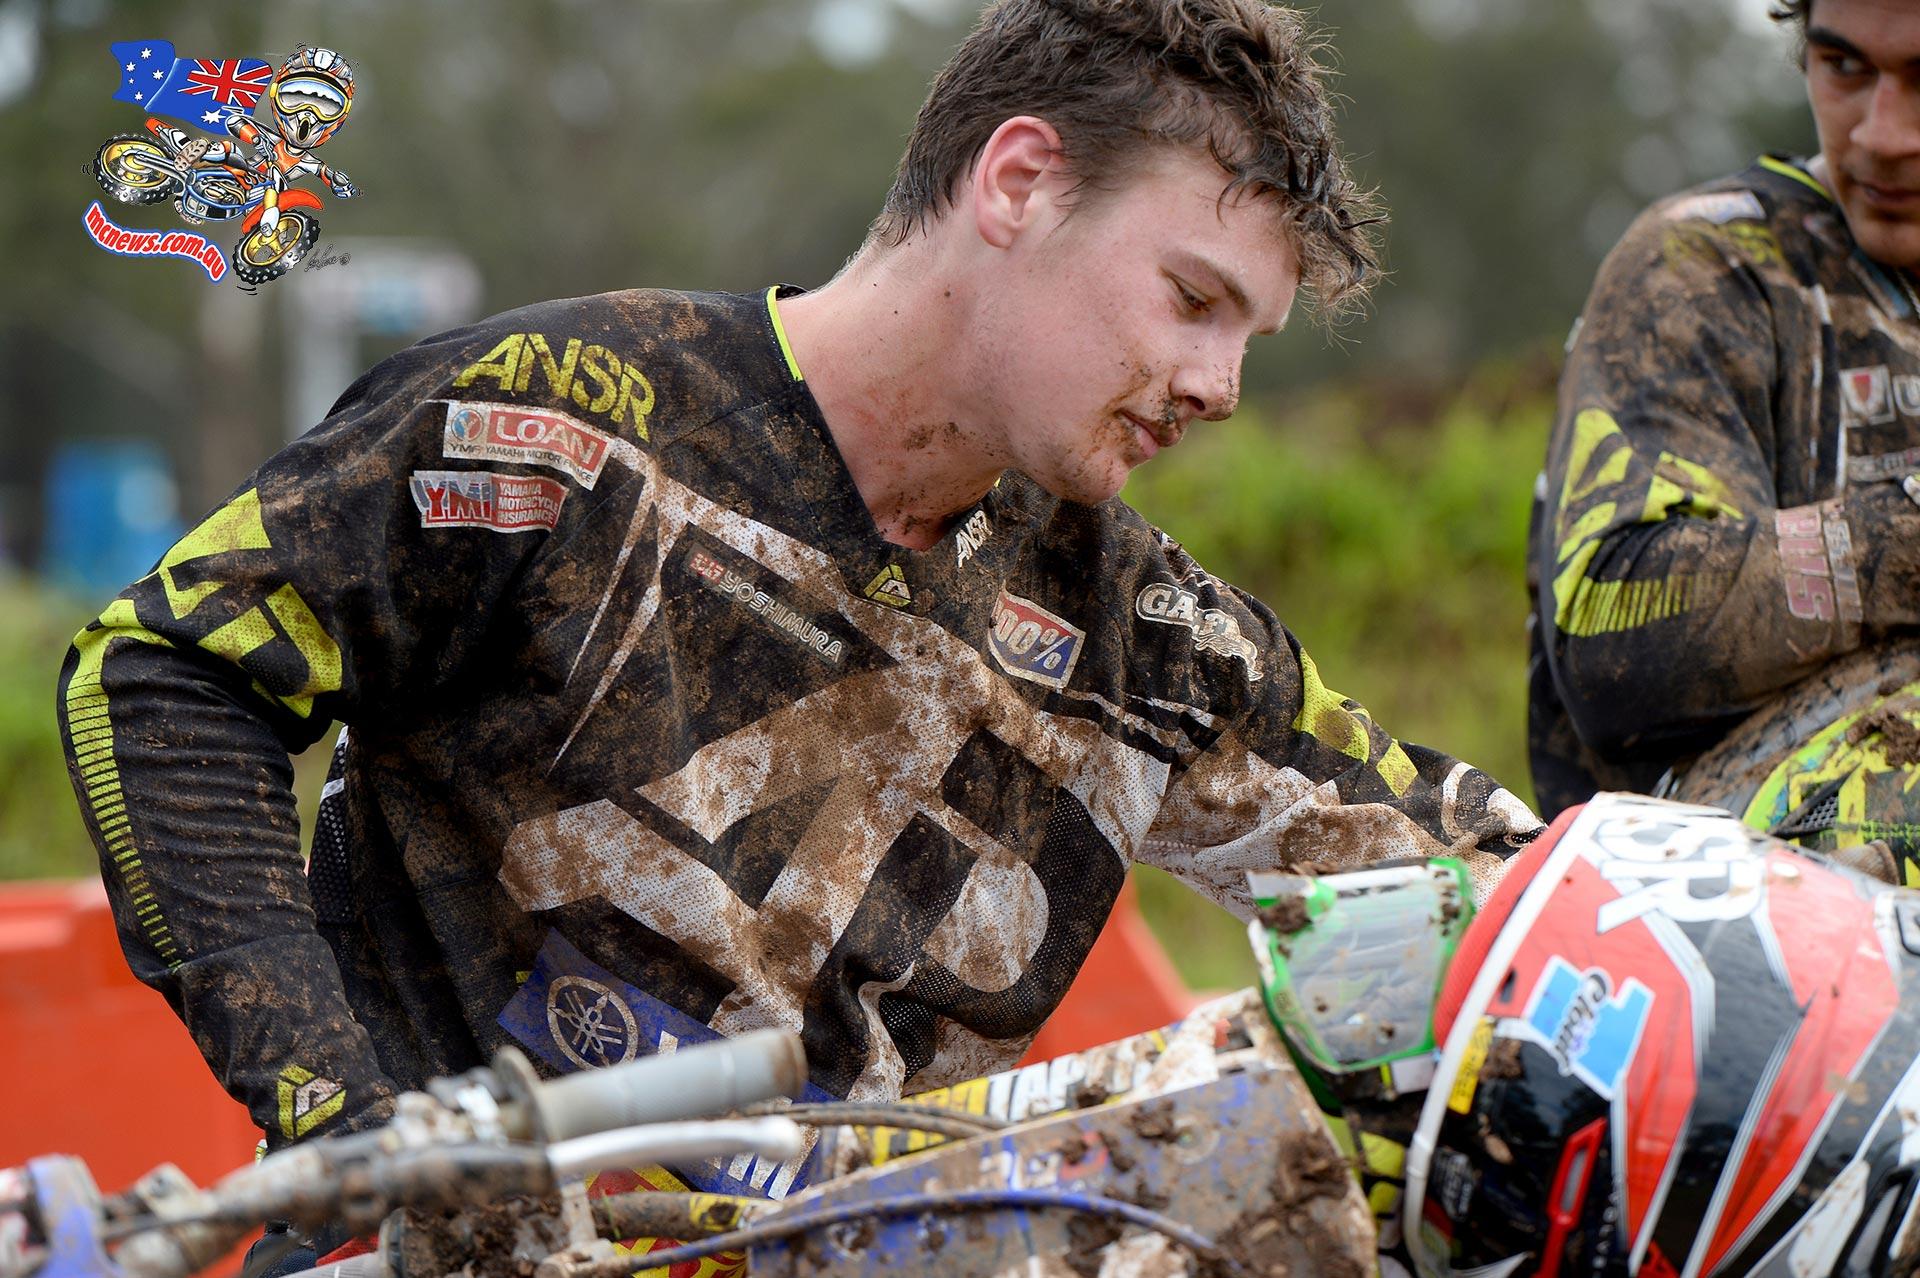 Luke Clout / Yamaha - 1st overall MX Nationals / Round 2 / MX2 Australian Motocross Championships Appin NSW Sunday 12 April 2015